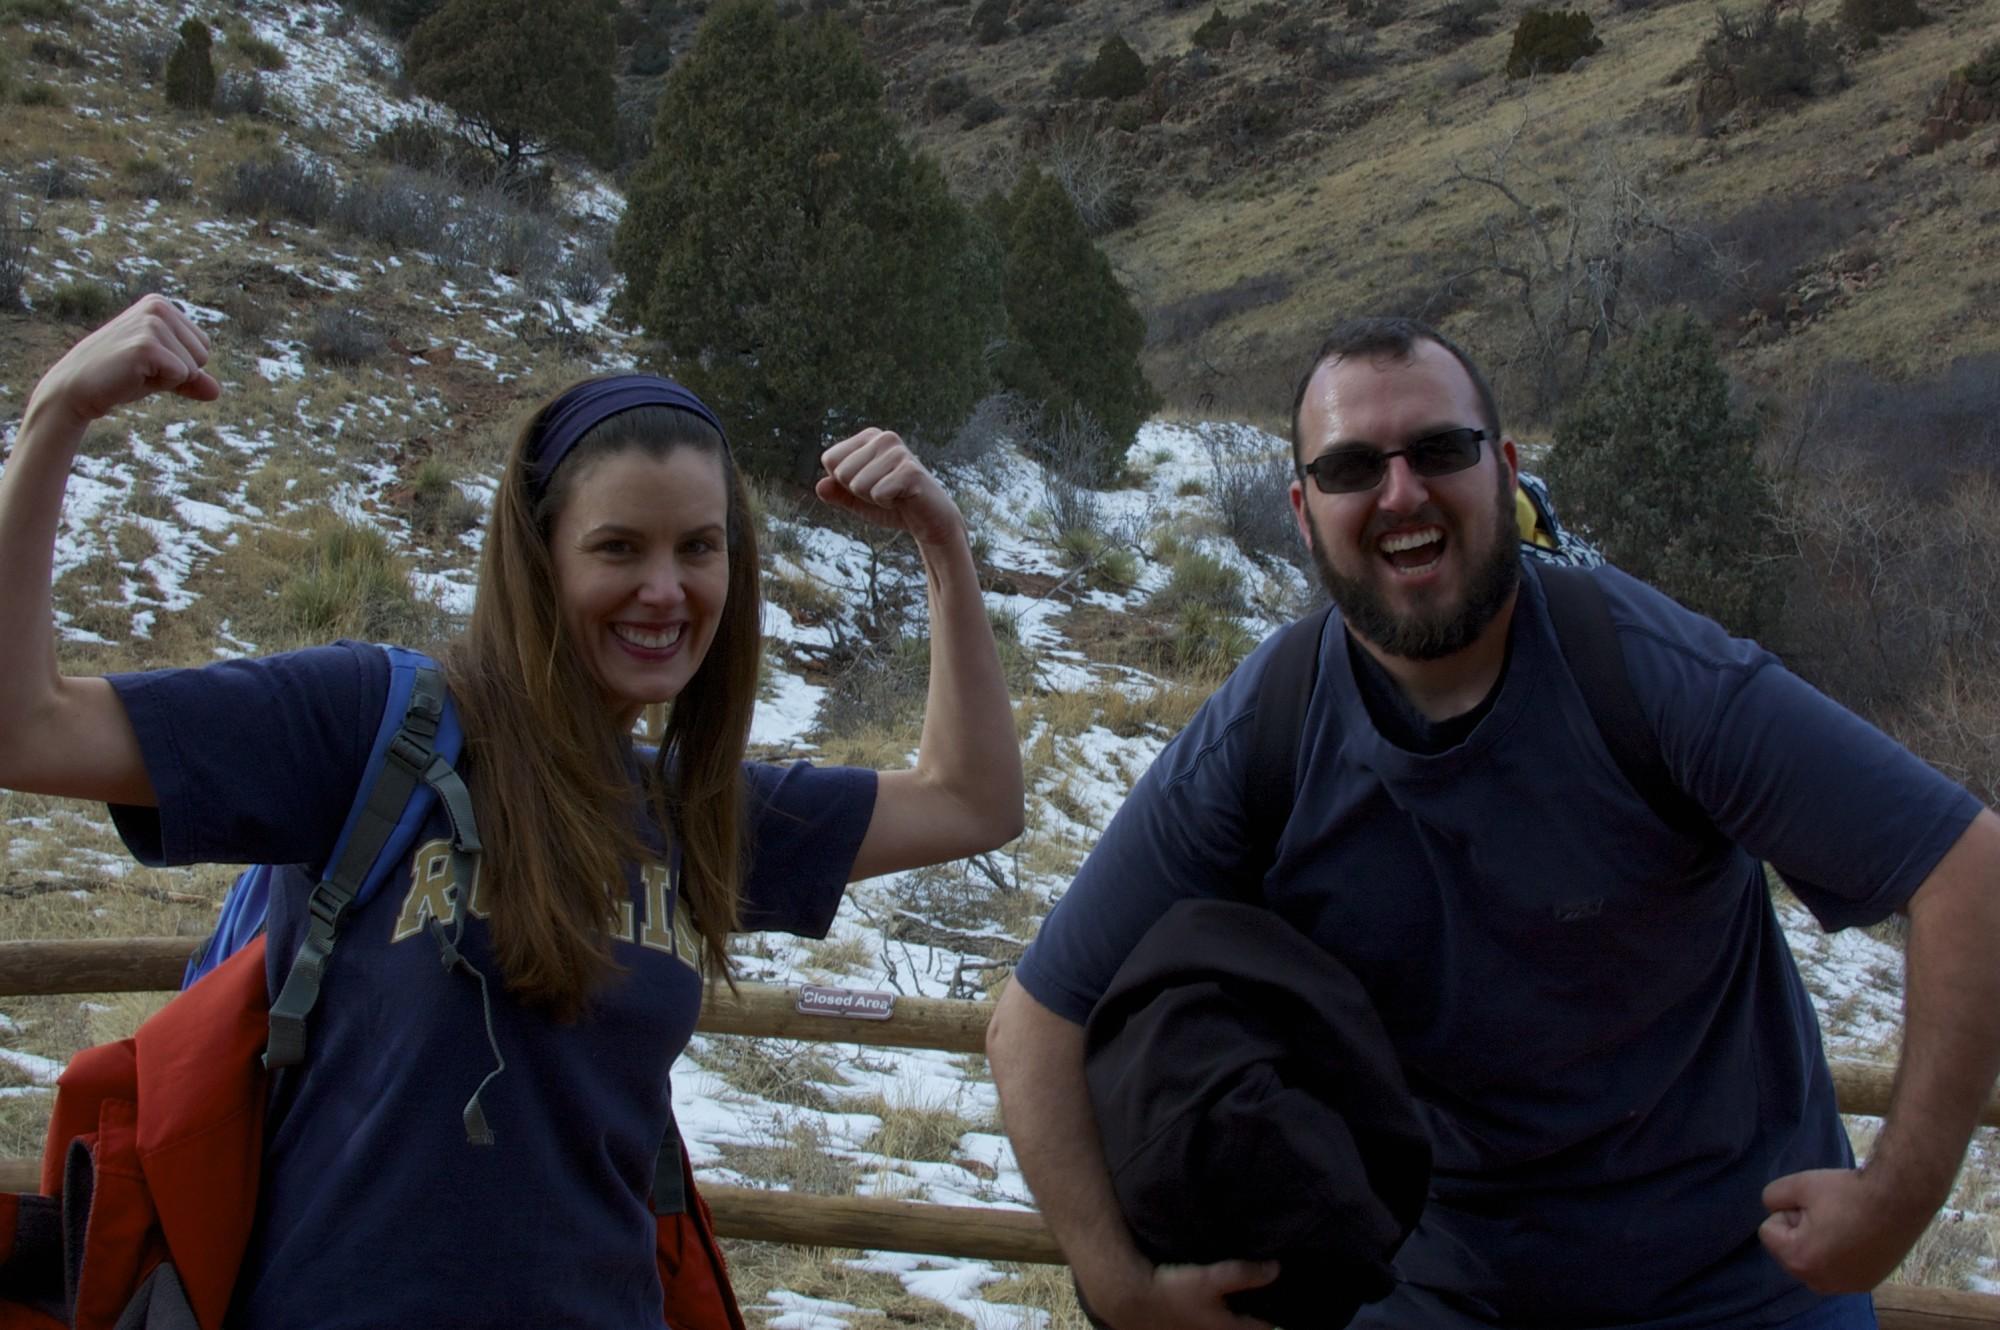 Beana and John acting tough at the top of Red Rocks